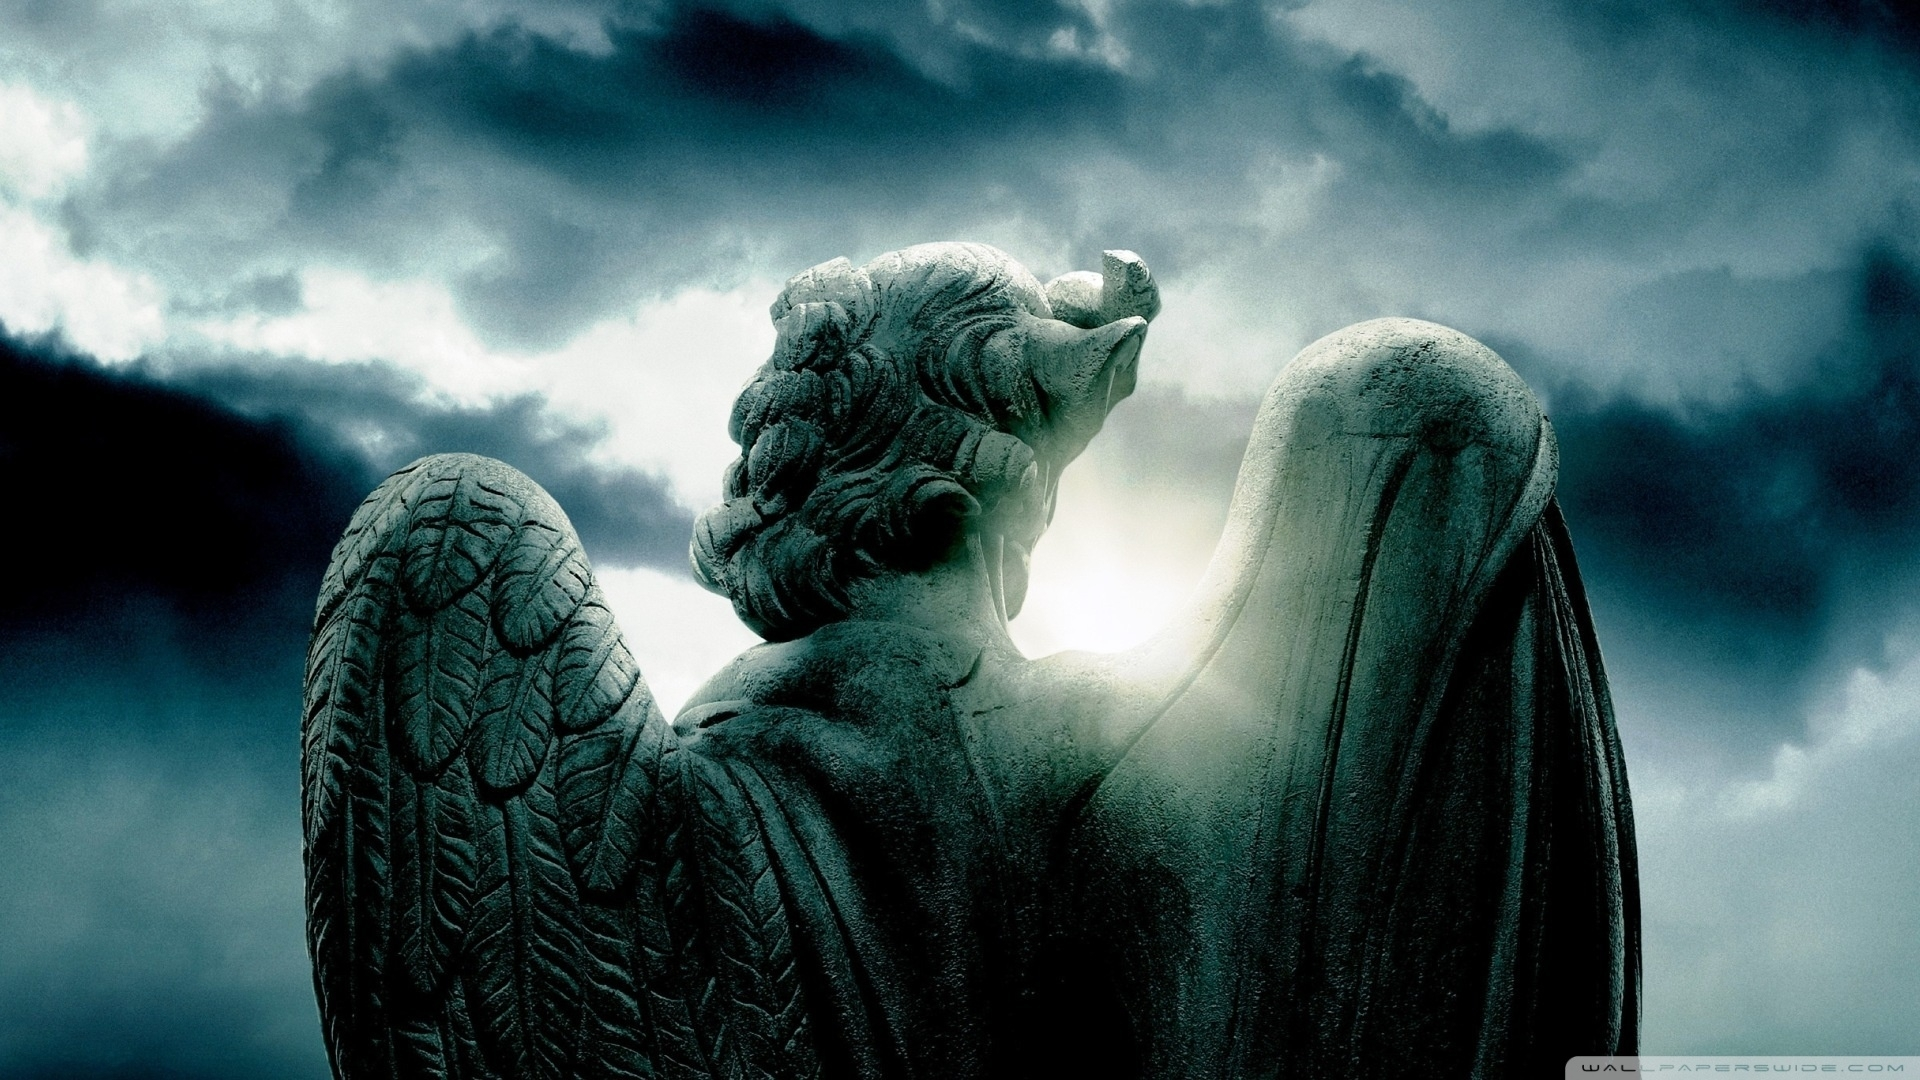 2009 angels and demons ❤ 4k hd desktop wallpaper for 4k ultra hd tv